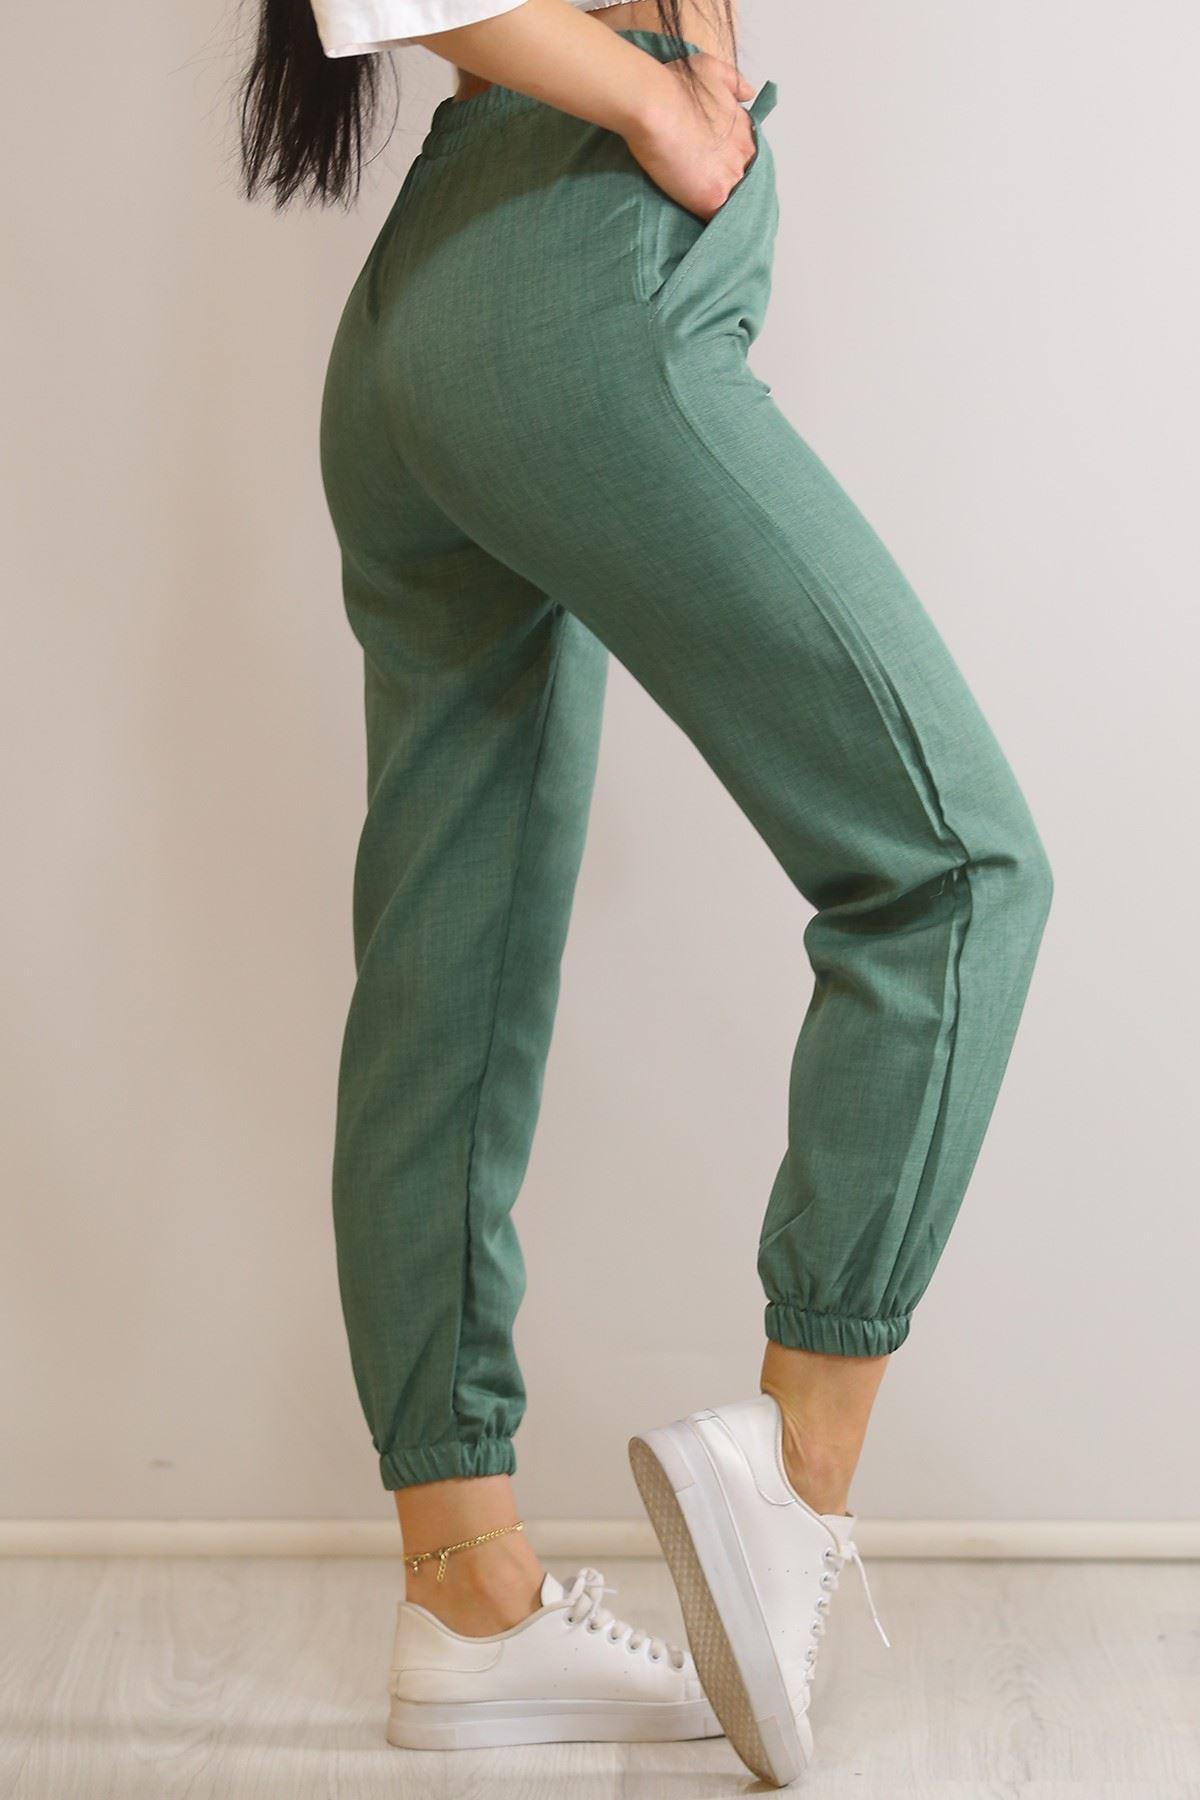 Beli Lastikli Dokuma Pantolon Yeşil - 5936.128.